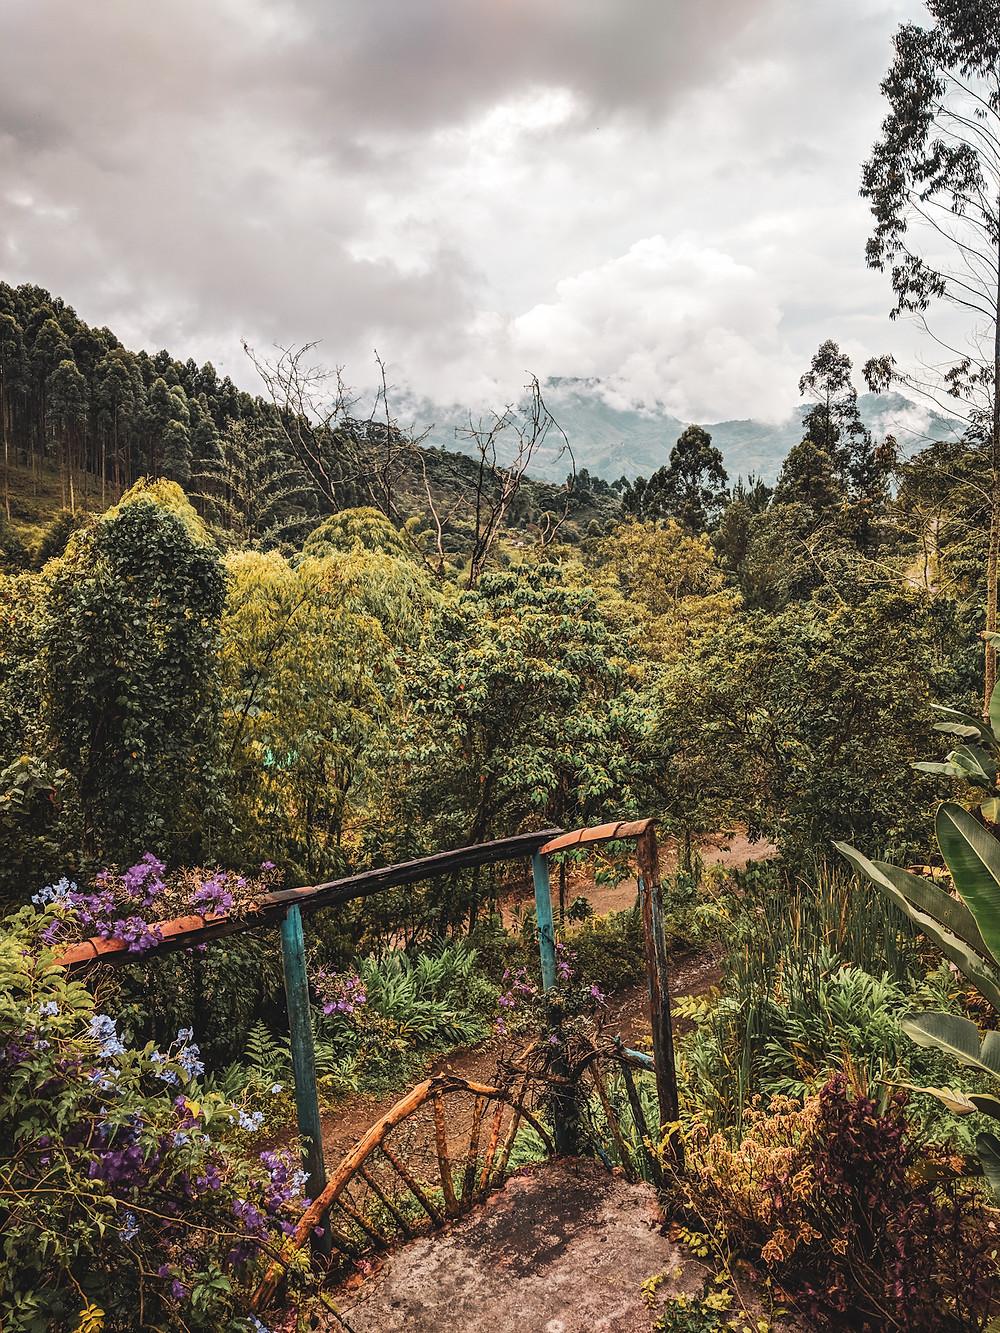 Mountain views in Jardin, Colombia.